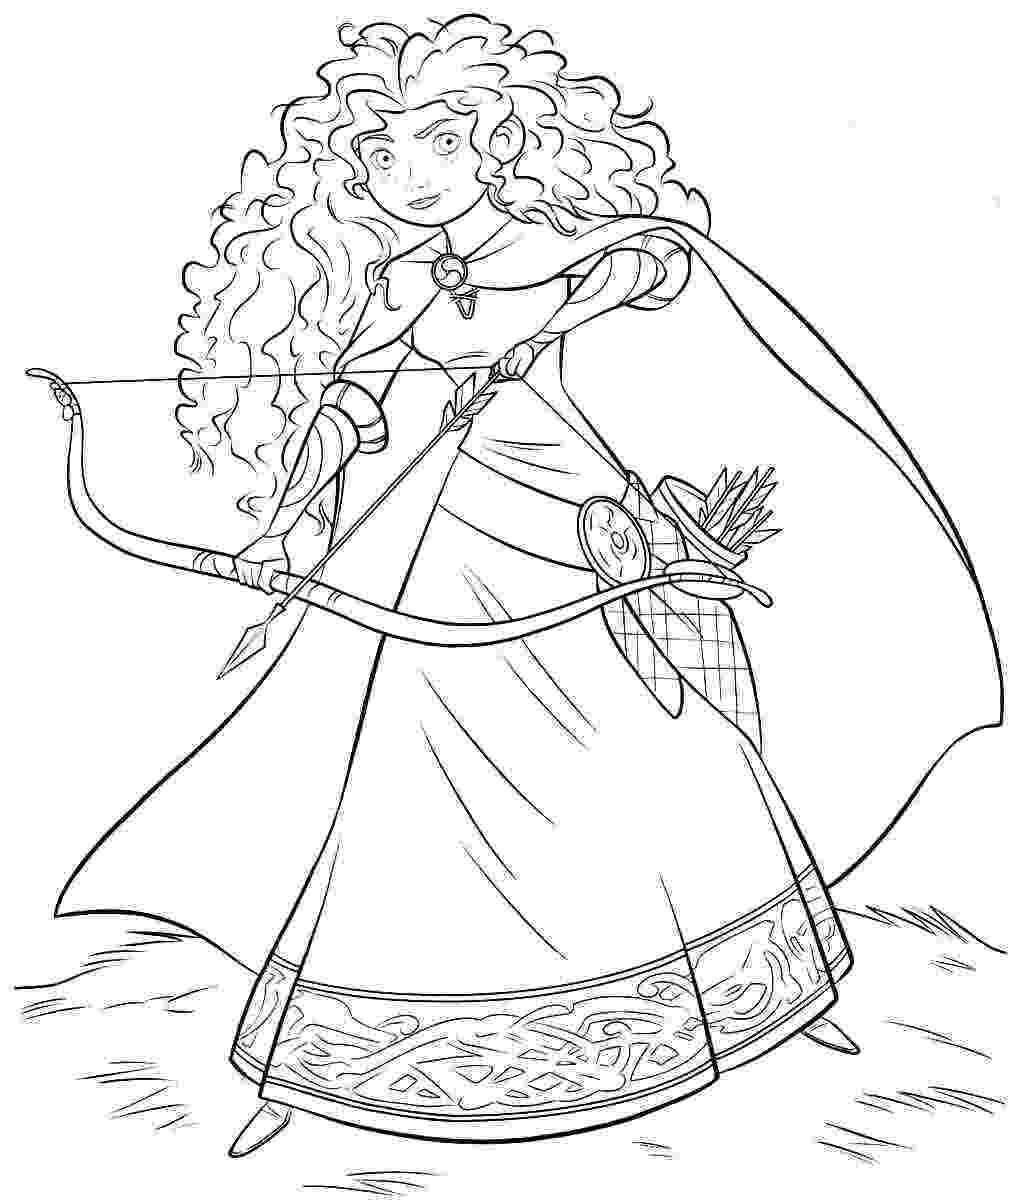 disnep princess coloring pages printable disney little princesses printable coloring pages disney coloring princess disnep printable pages